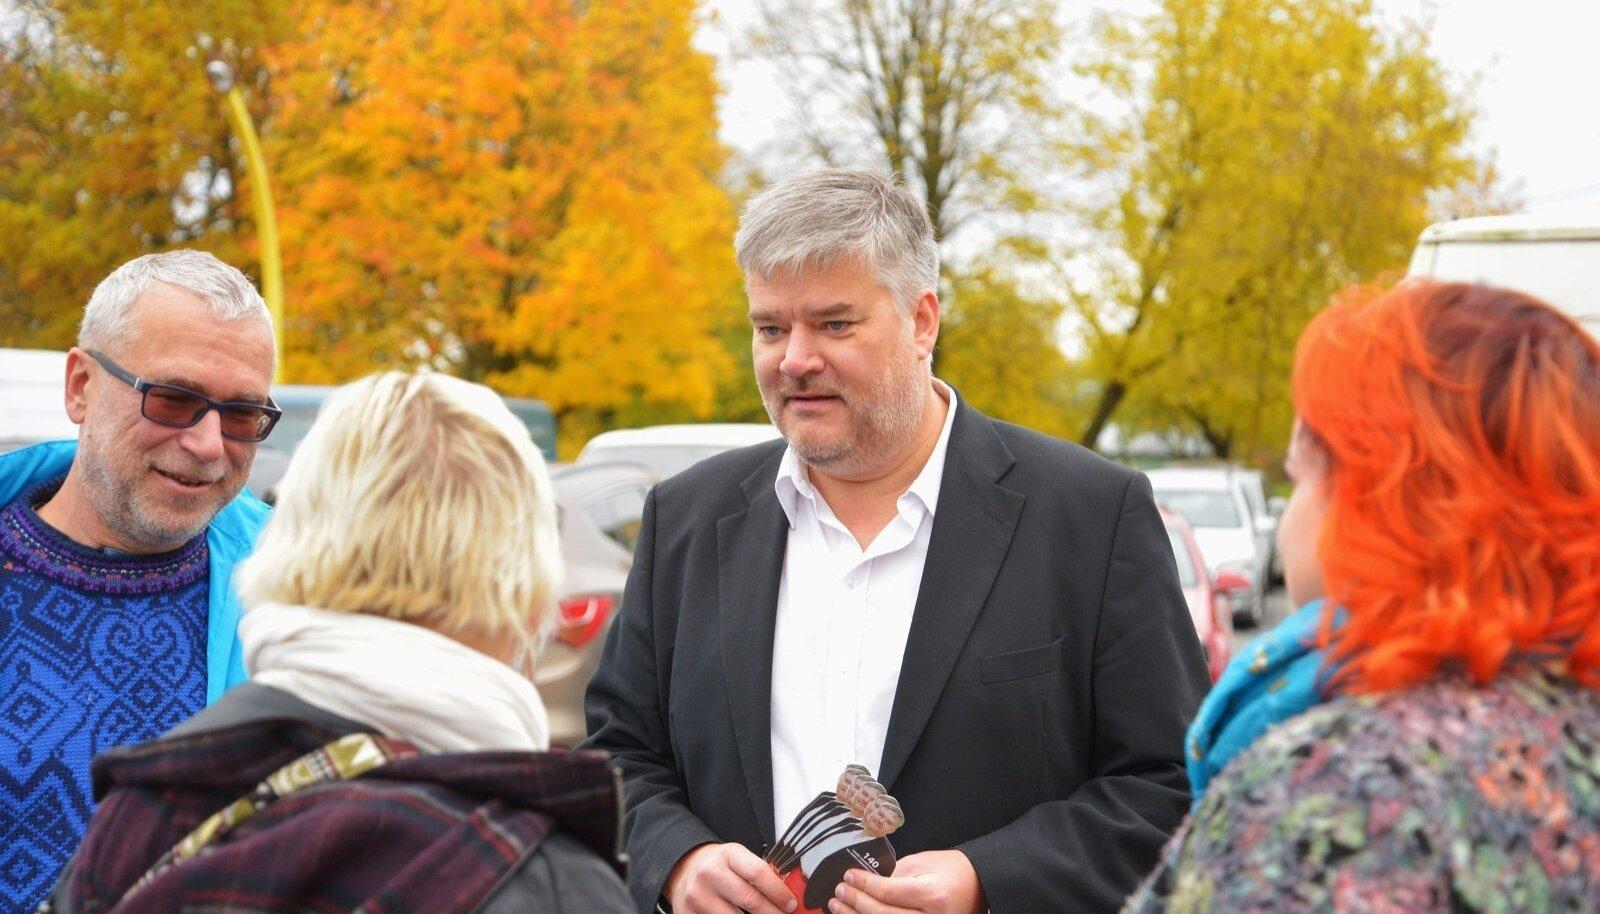 Viljandi küünlatehase Hansa Candle omanik Harri Aaltonen